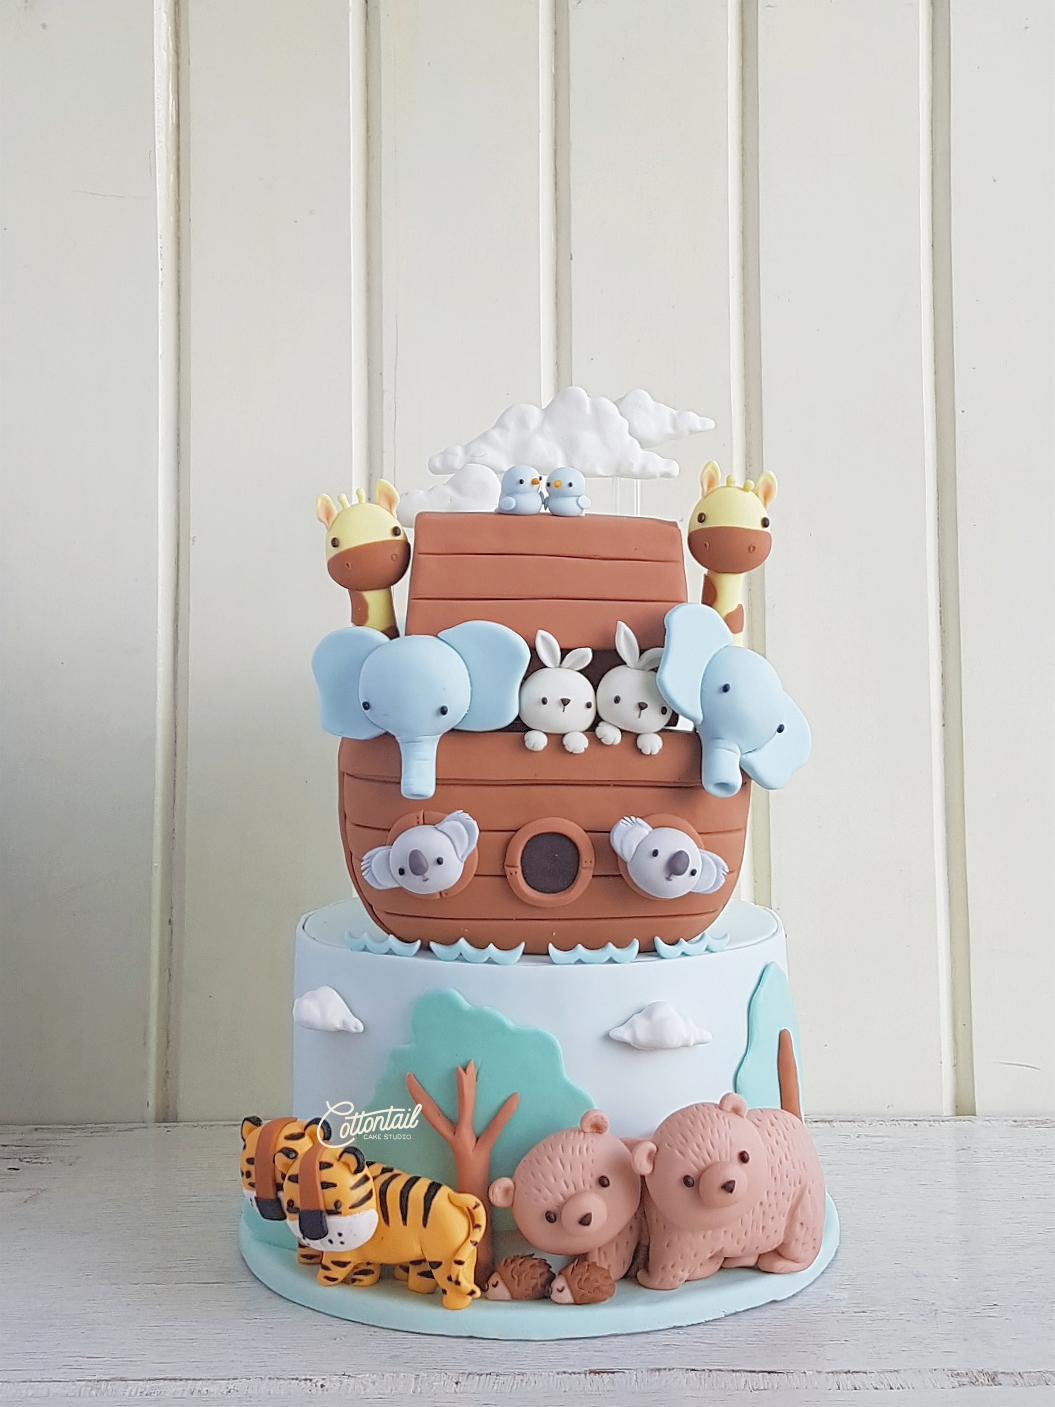 noah ark cake fondant kiddie party sugar art cake artist ...